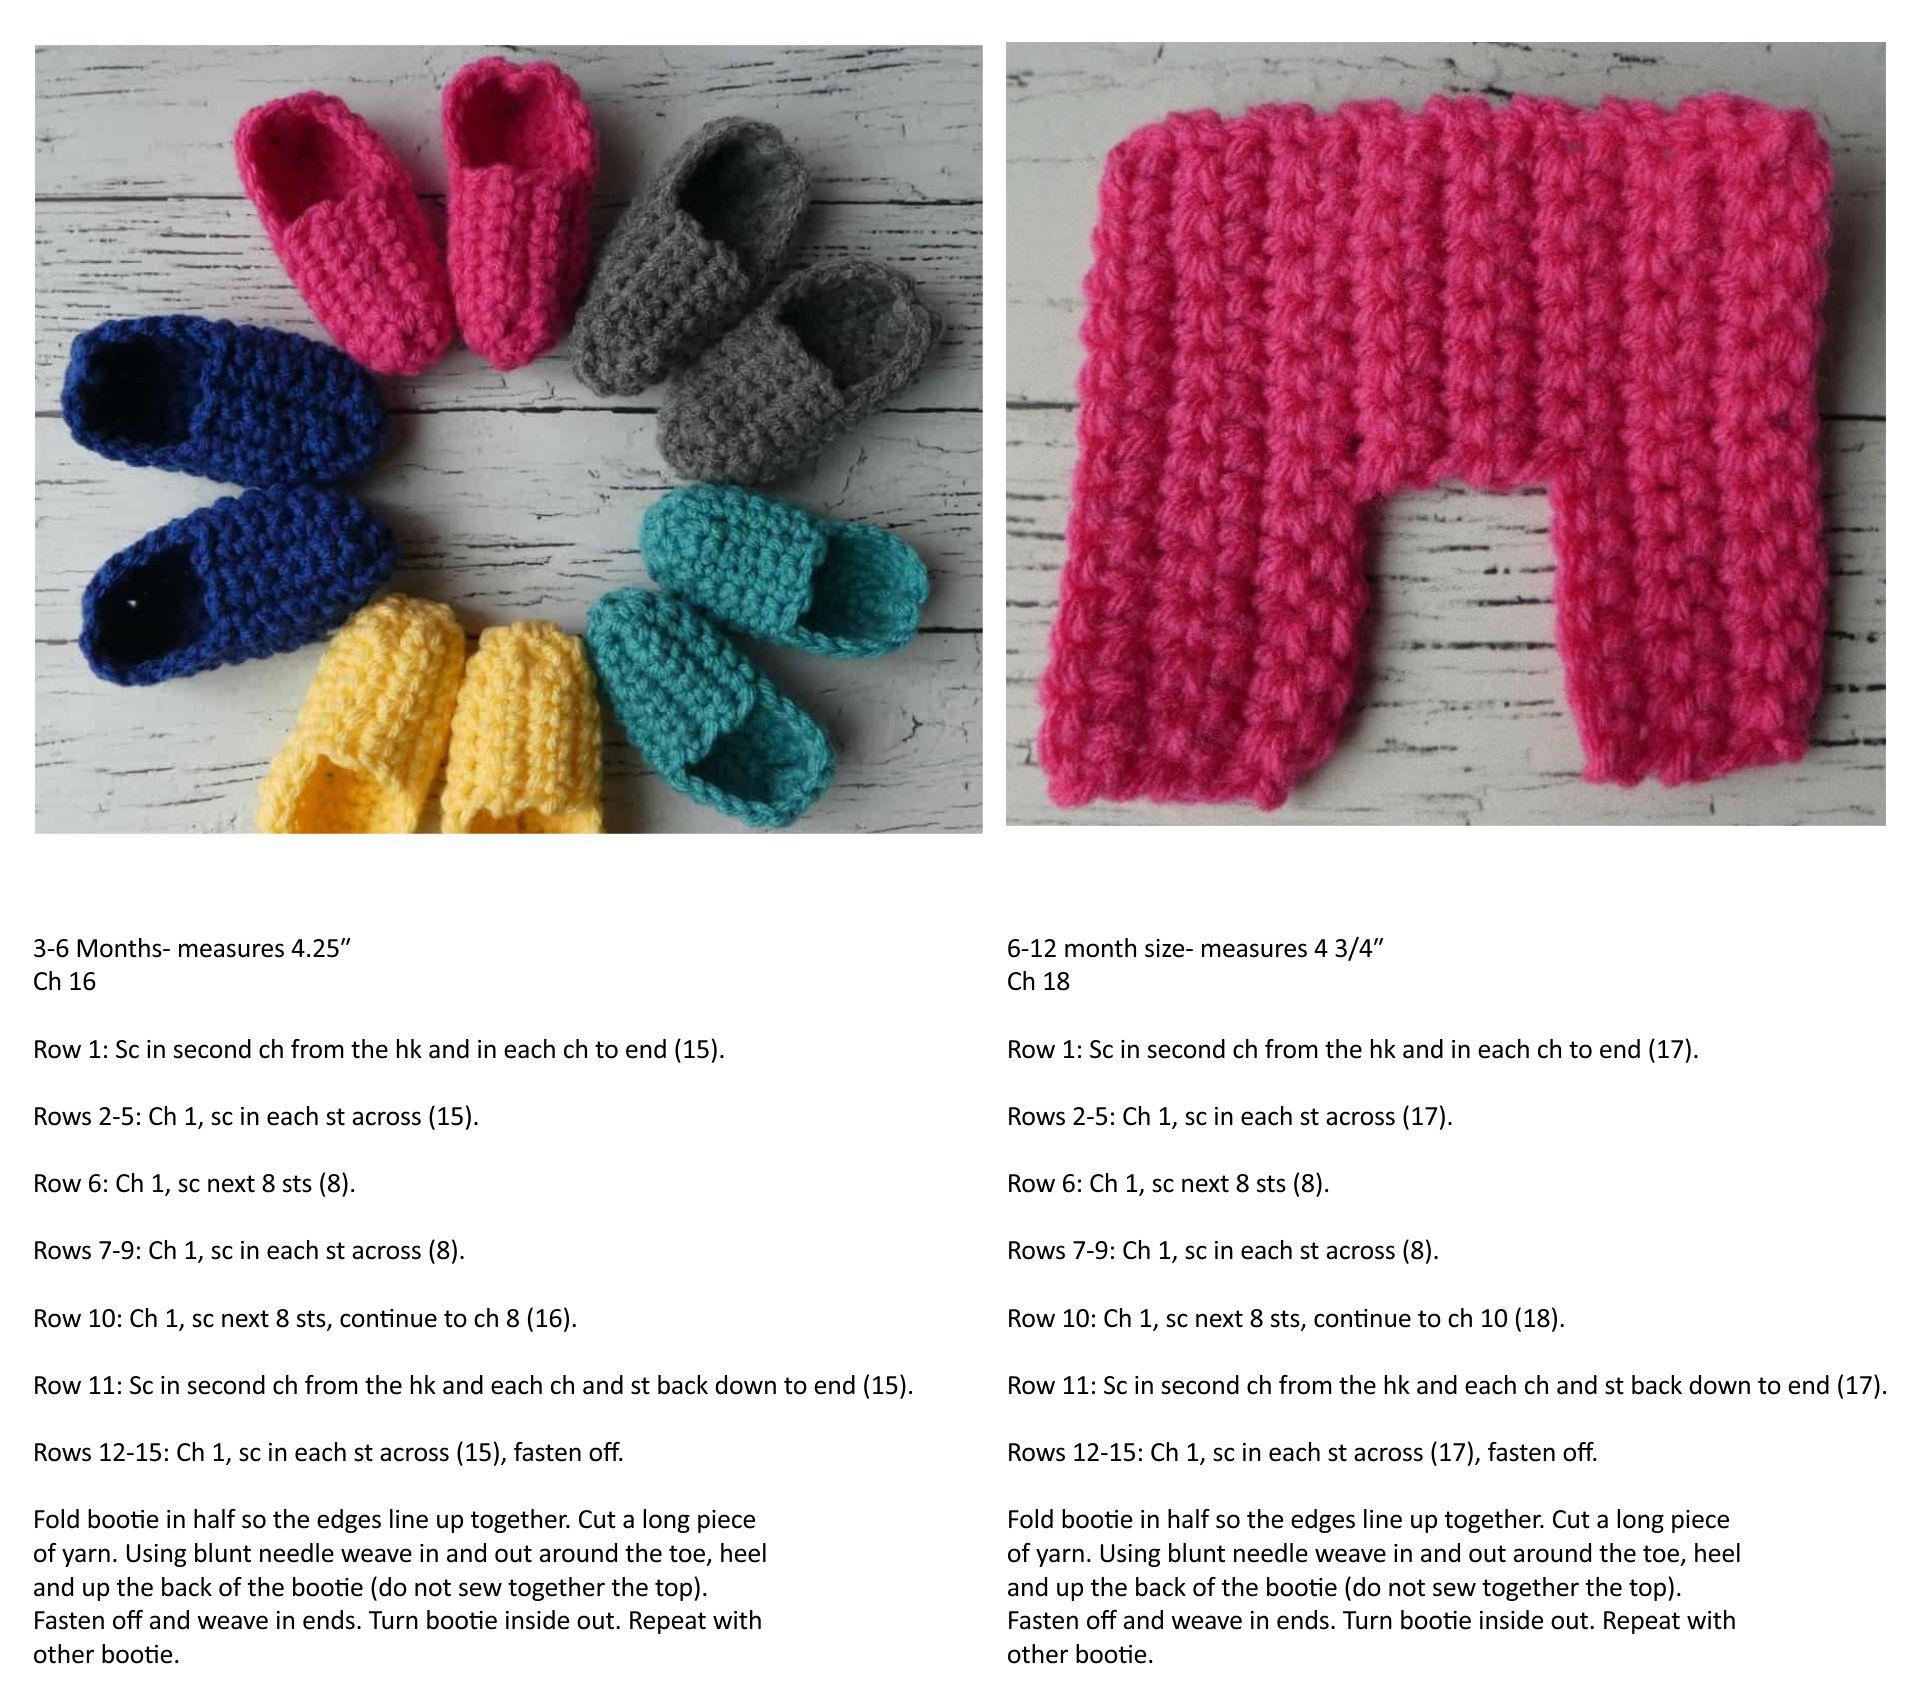 Easy Crochet Baby Booties Pattern